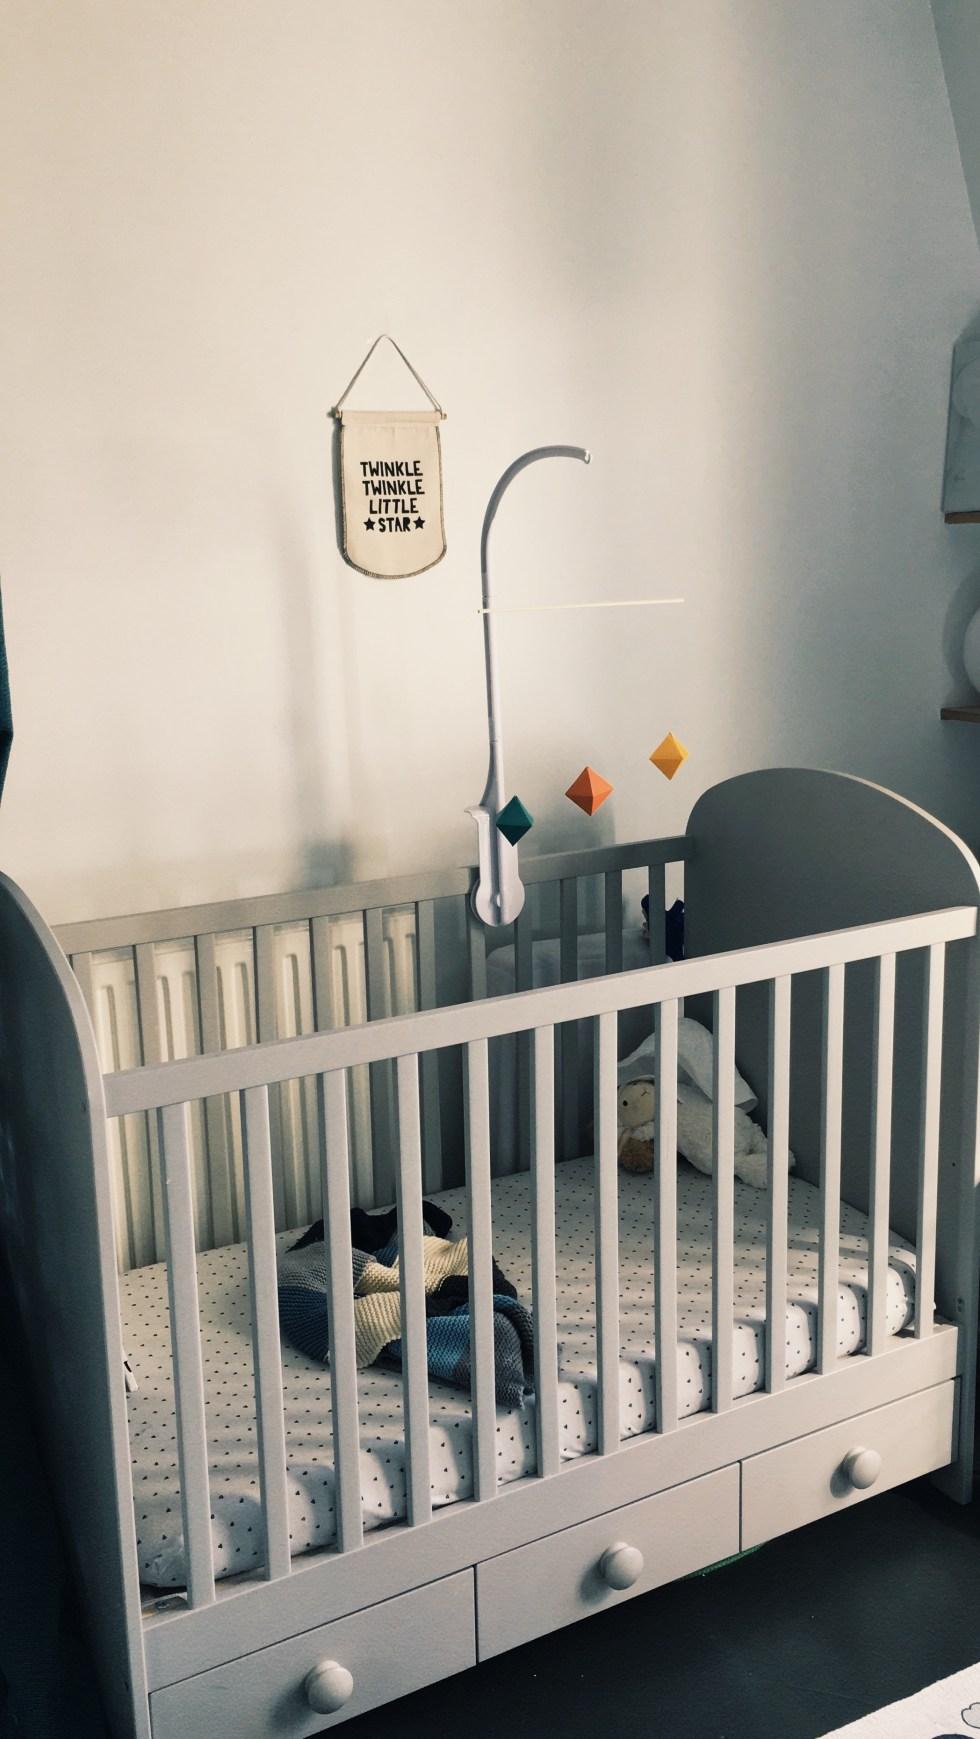 Our Tiny Home: Kids Nourish Paris